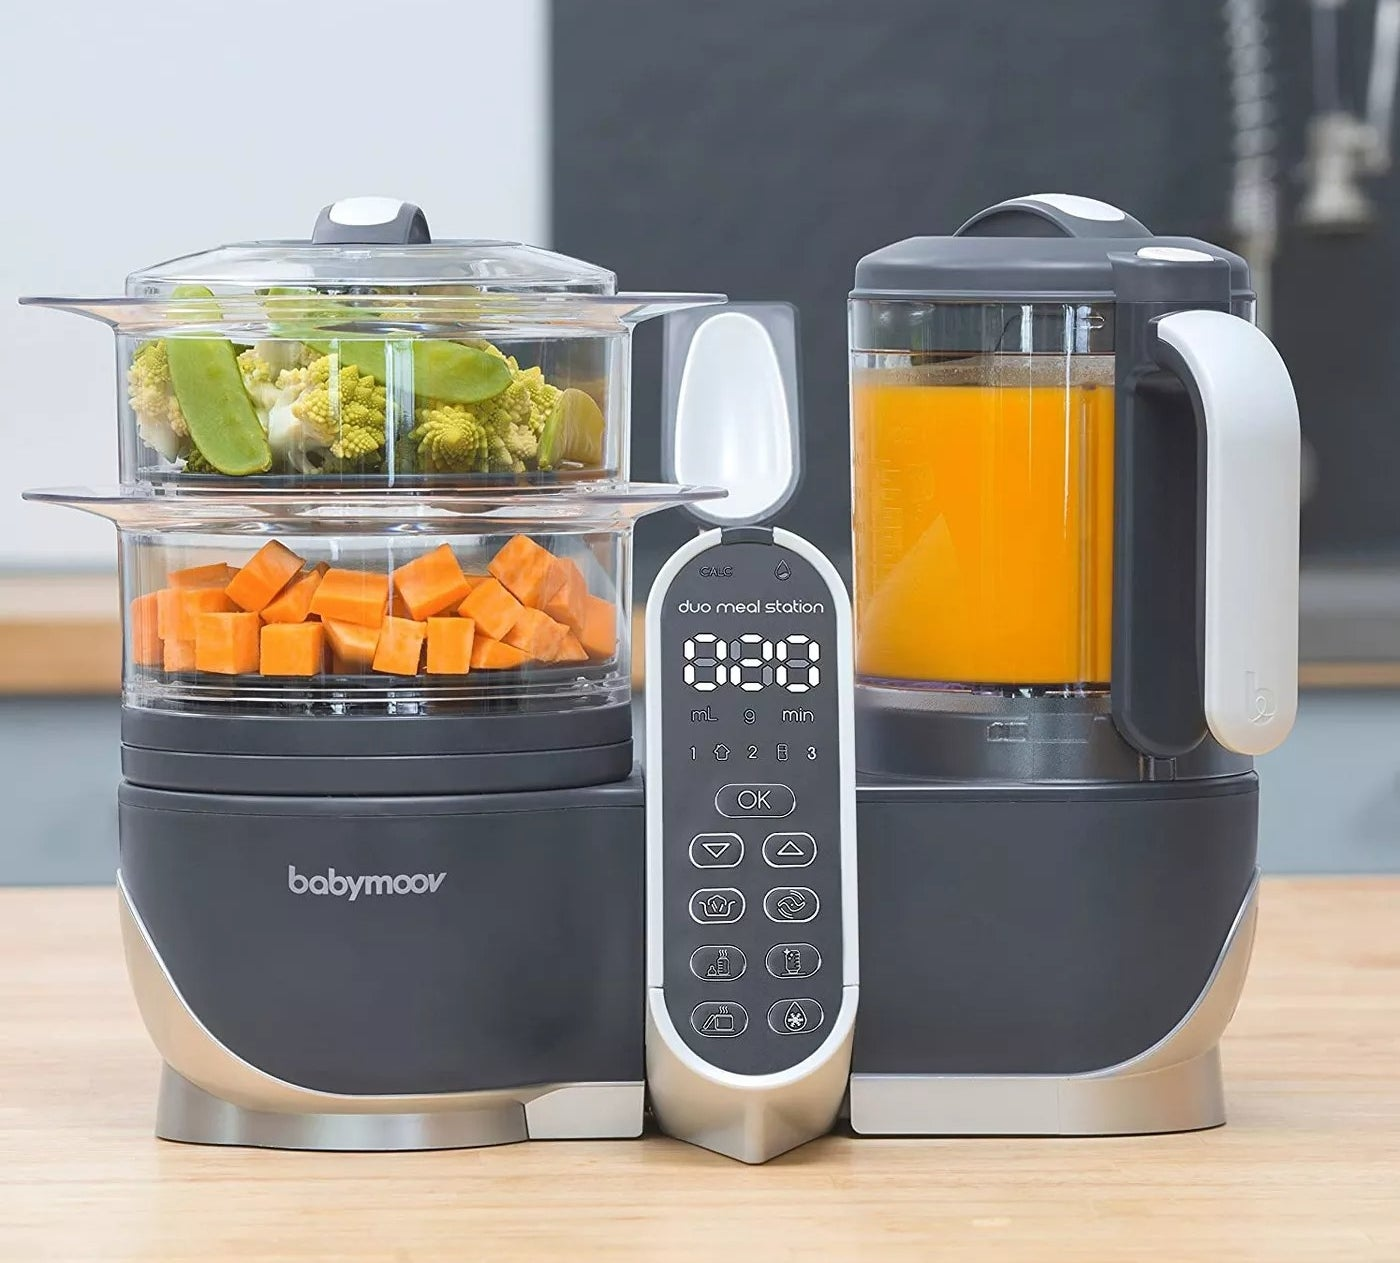 The babymoov food processor